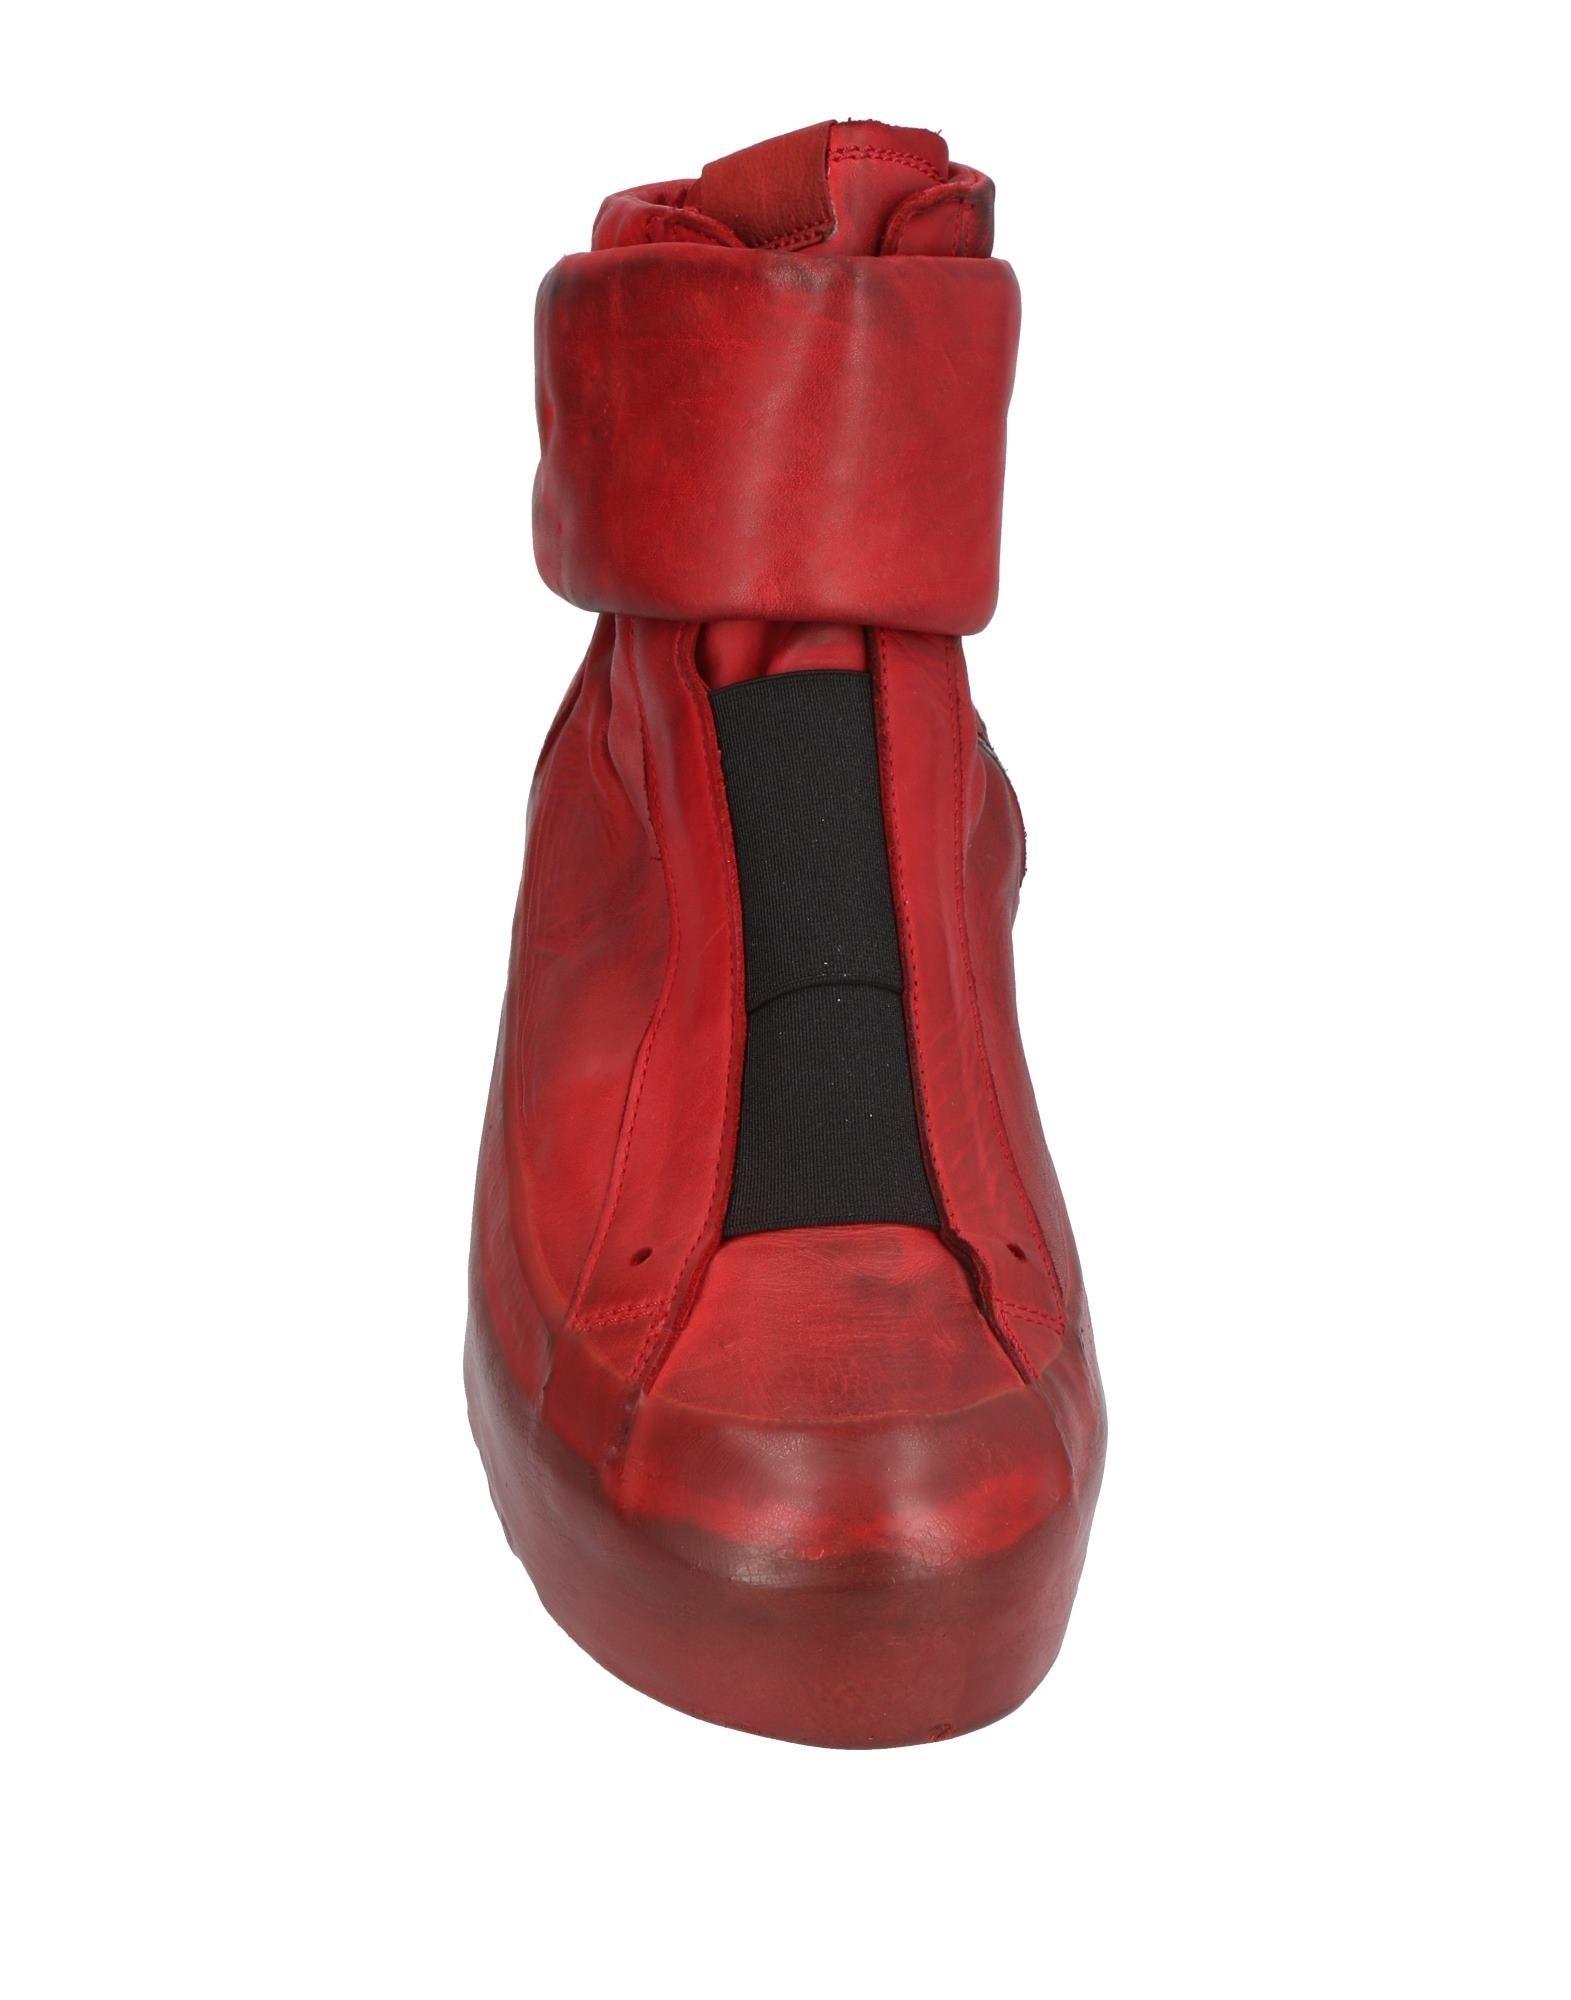 O.X.S. Rubber Gute Soul Sneakers Herren  11457555DO Gute Rubber Qualität beliebte Schuhe 9434e9